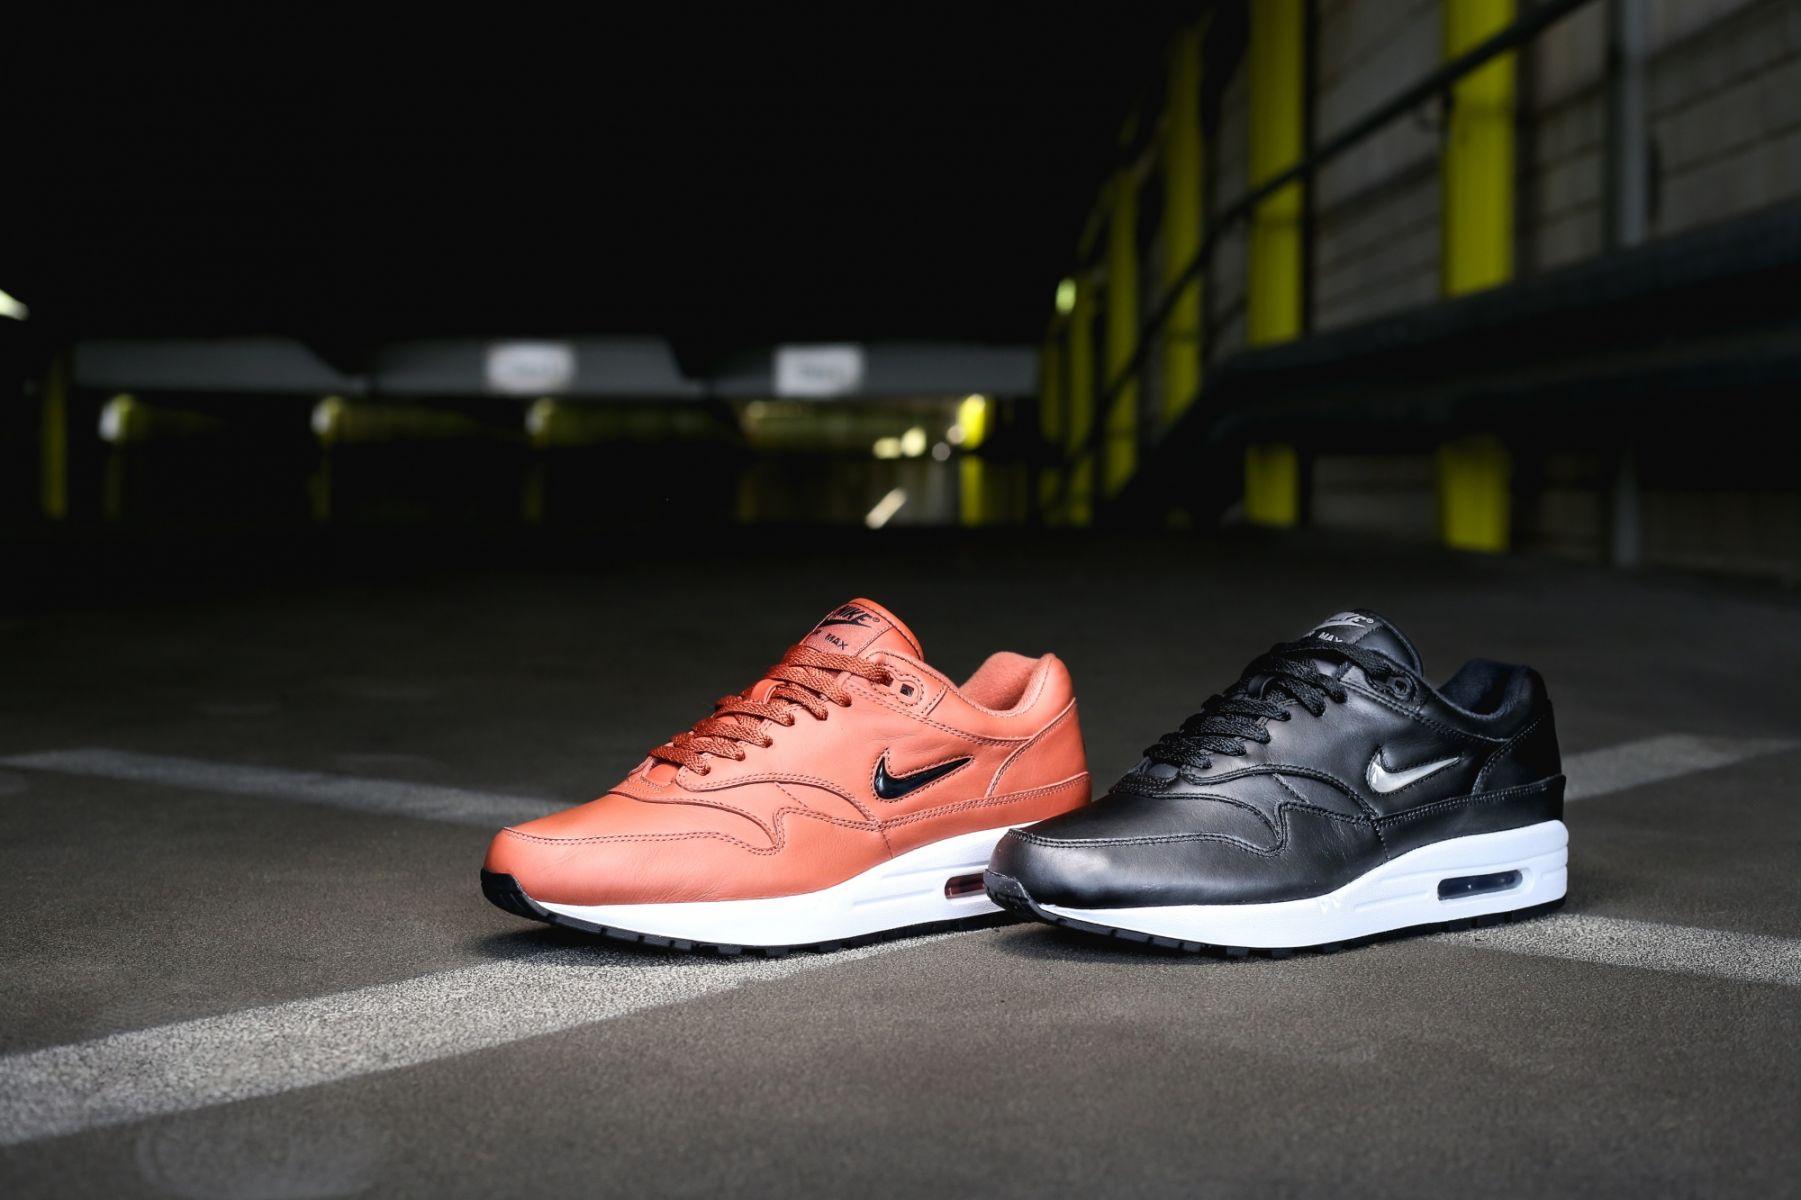 Nike Air Max 1 Jewel Premium Dusty Peach | Alle Release